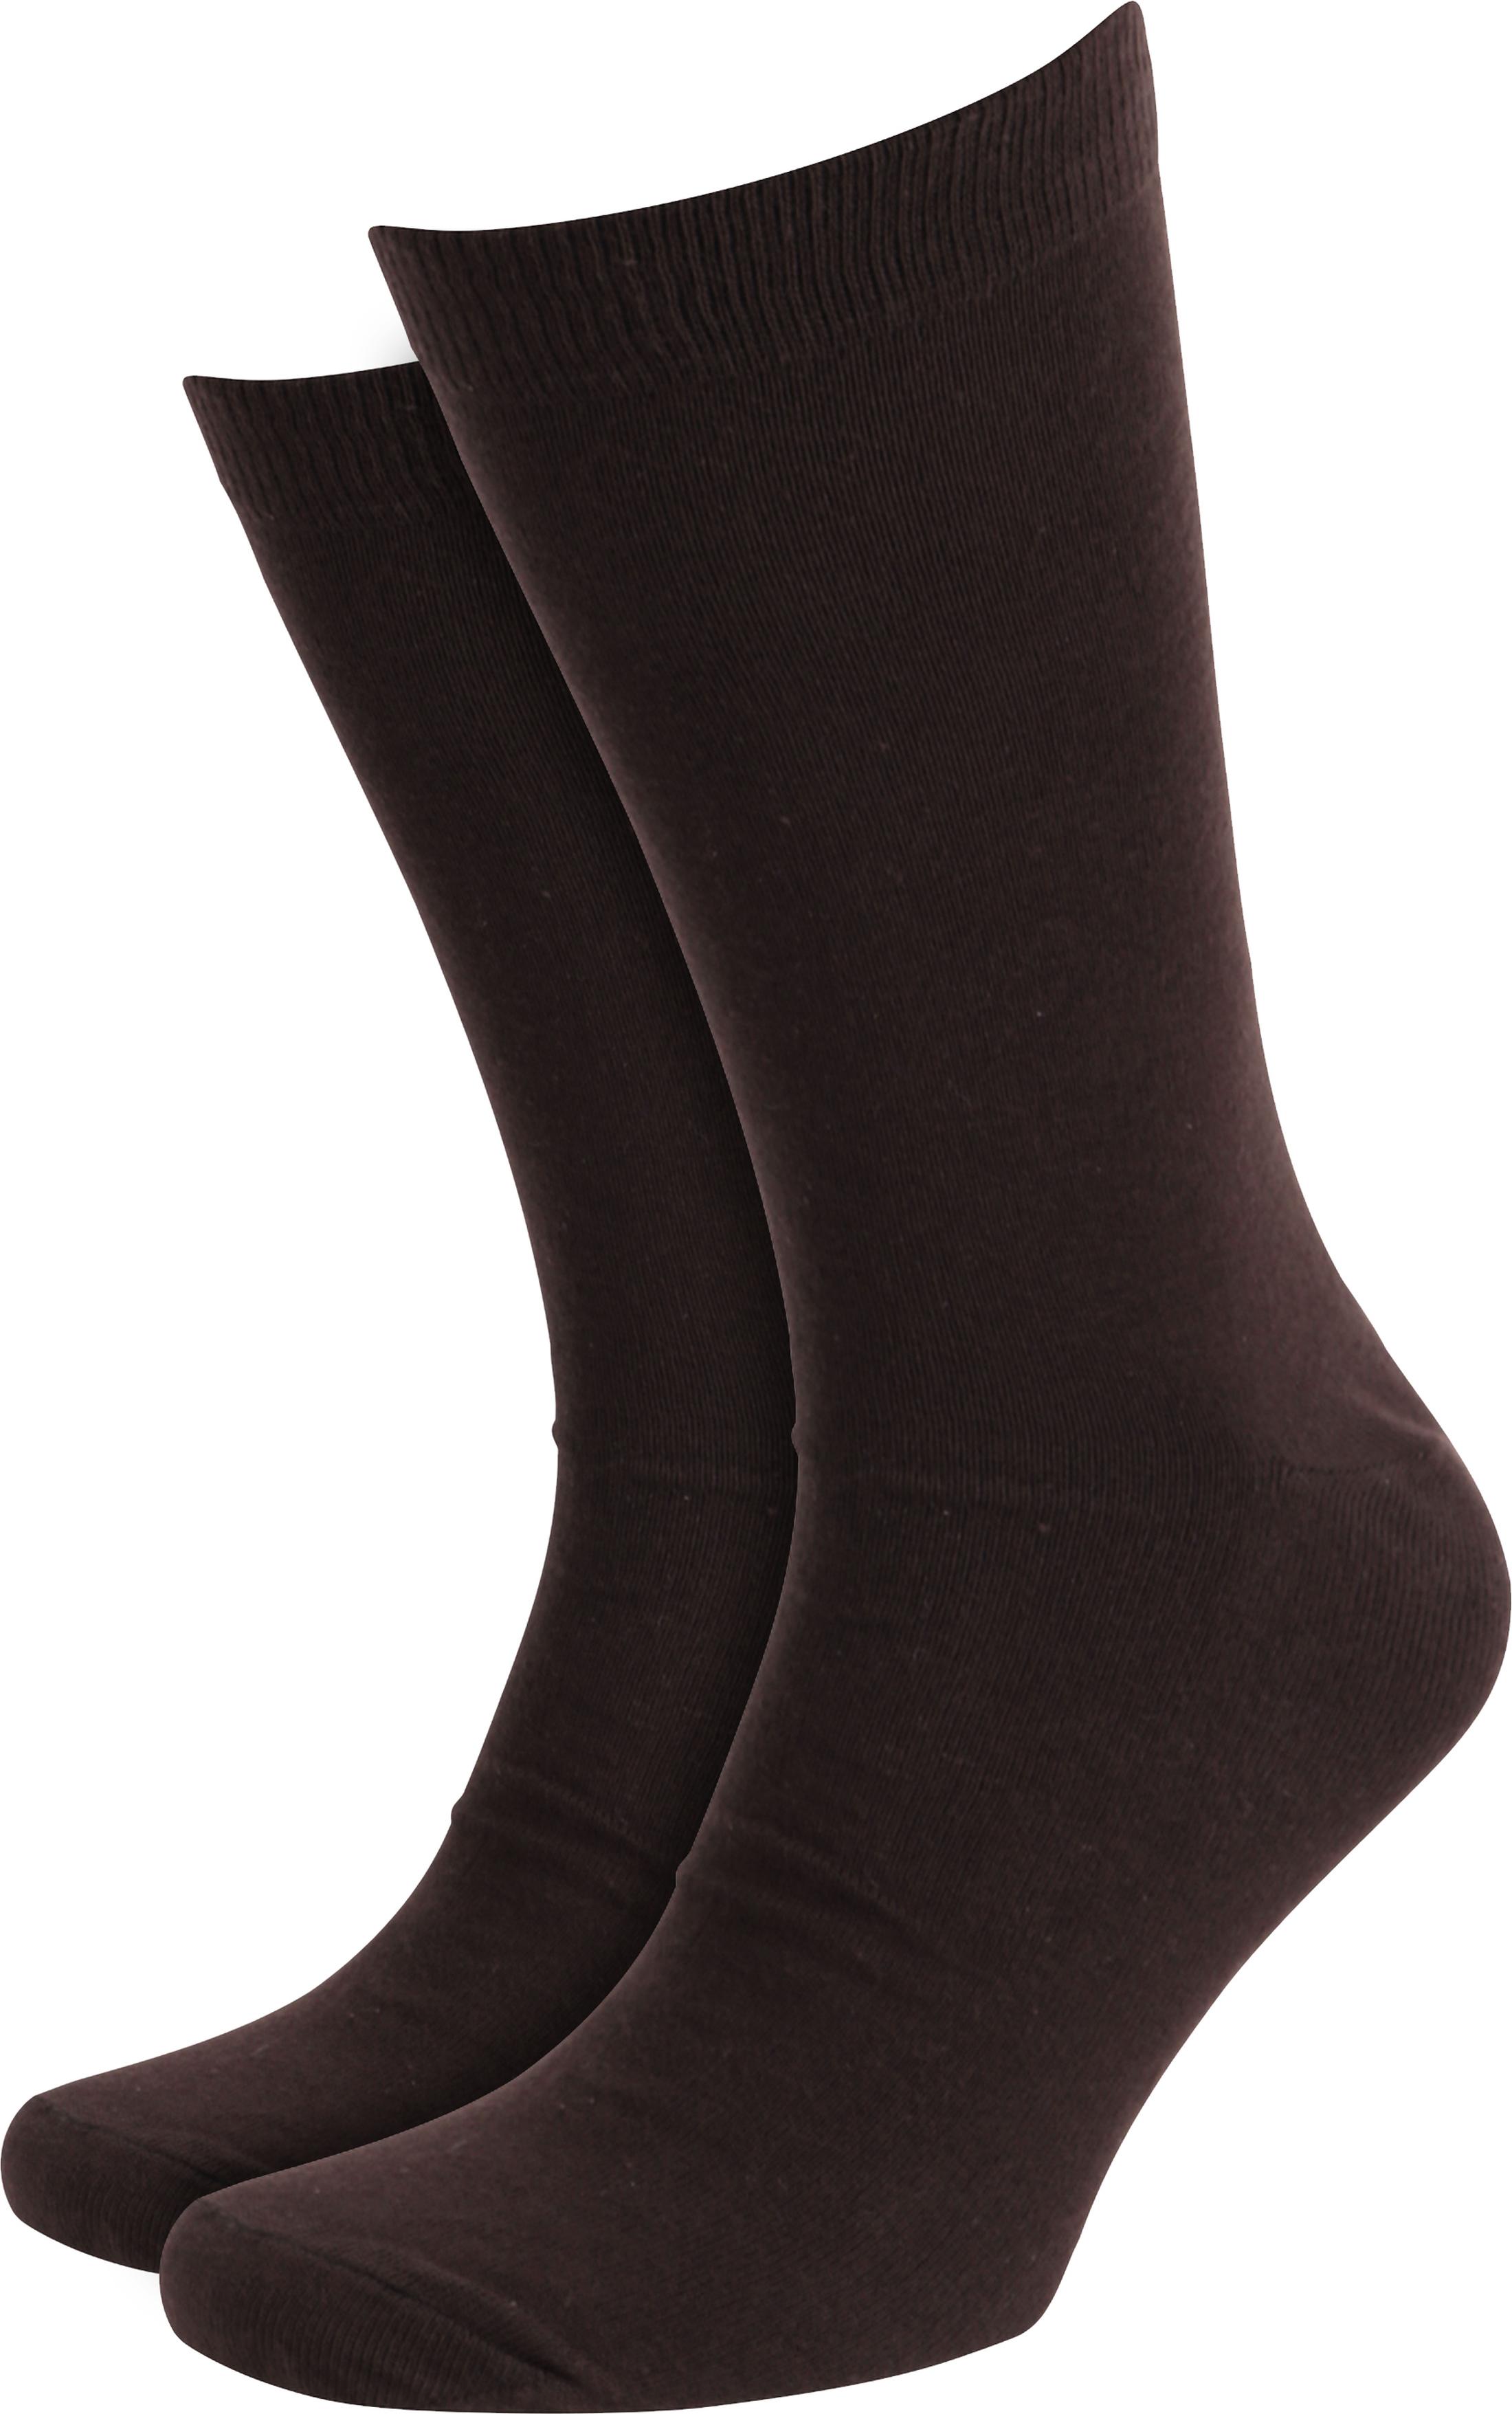 Suitable Socken Braun